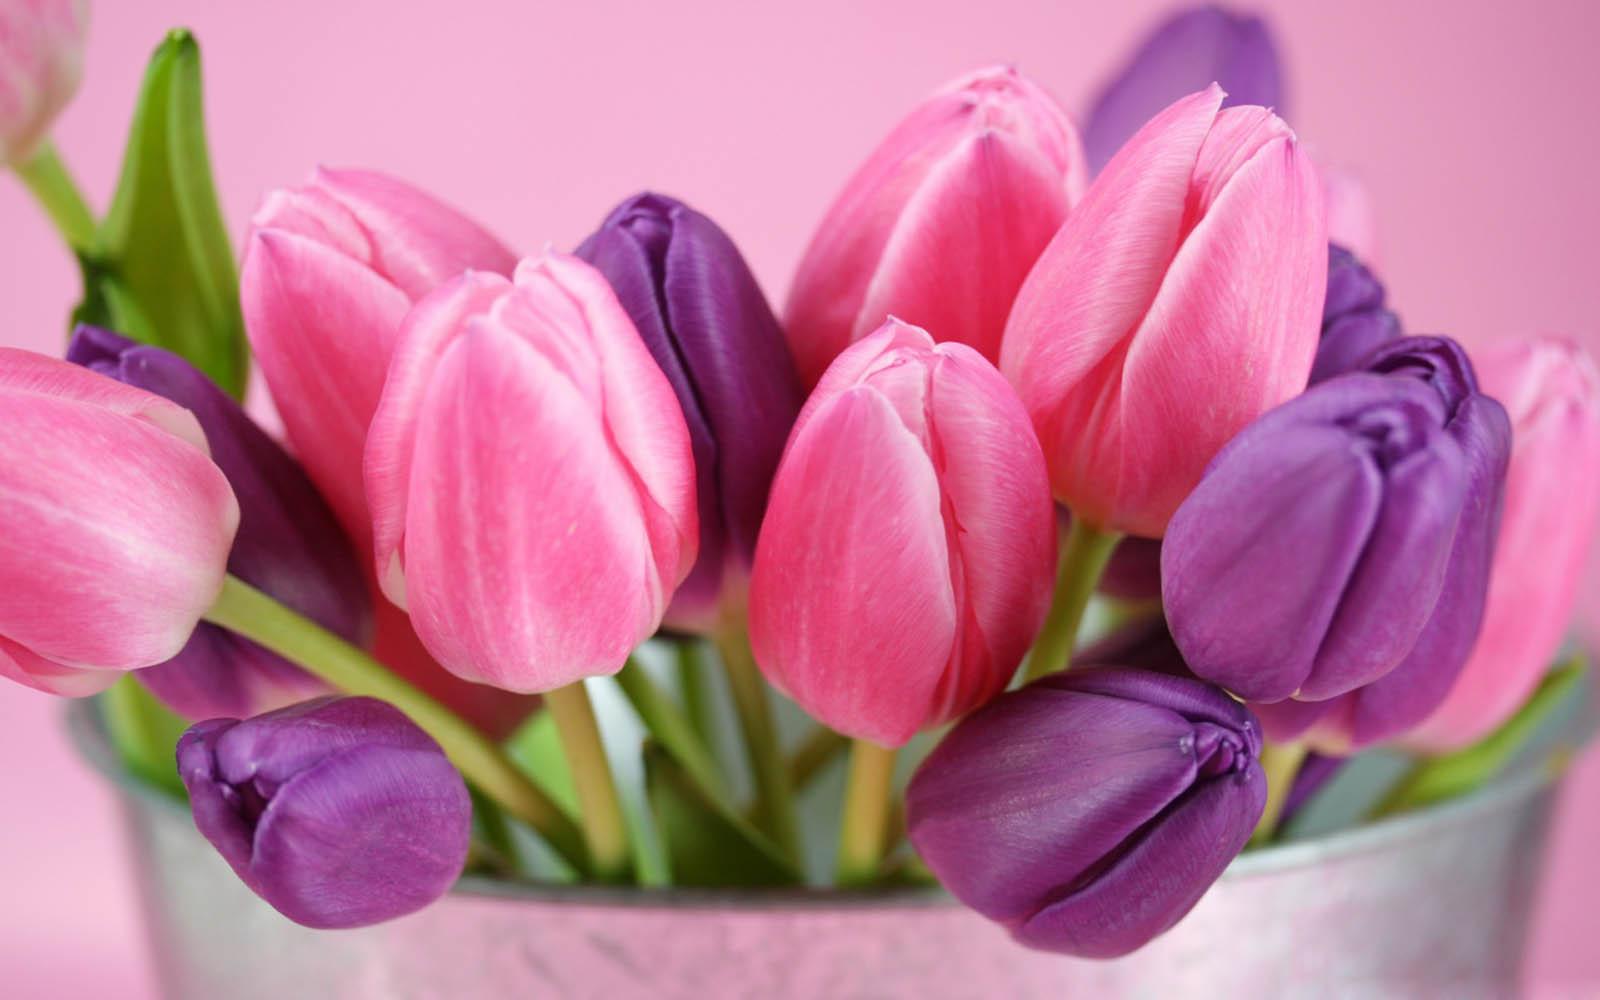 wallpapers Purple Tulips Flowers Wallpapers 1600x1000